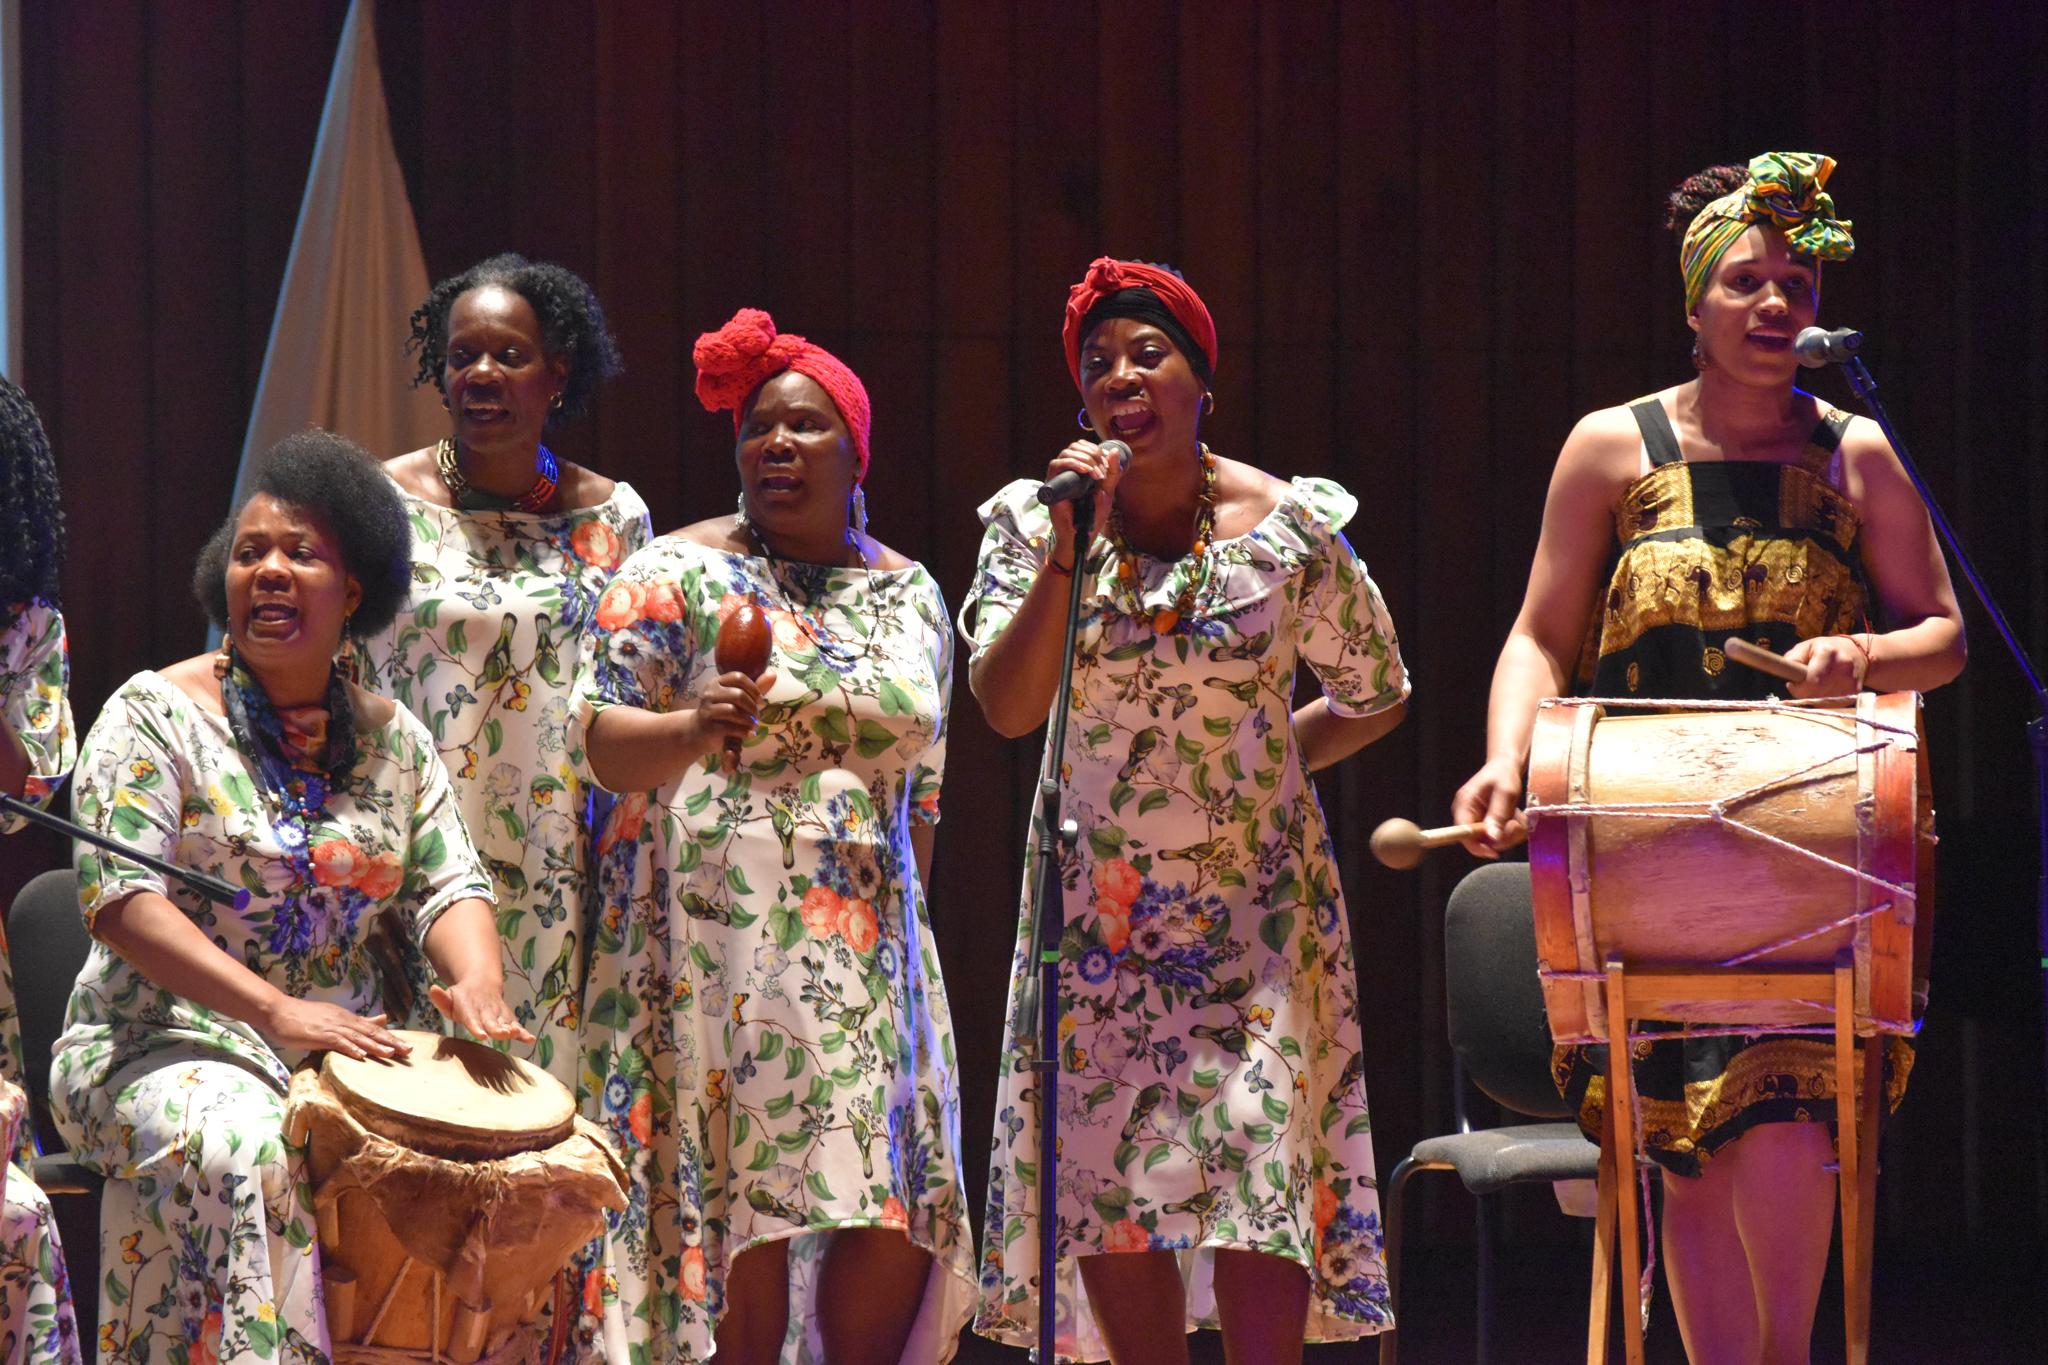 Presentación del grupo Echembelé (Foto: Aura Flechas)